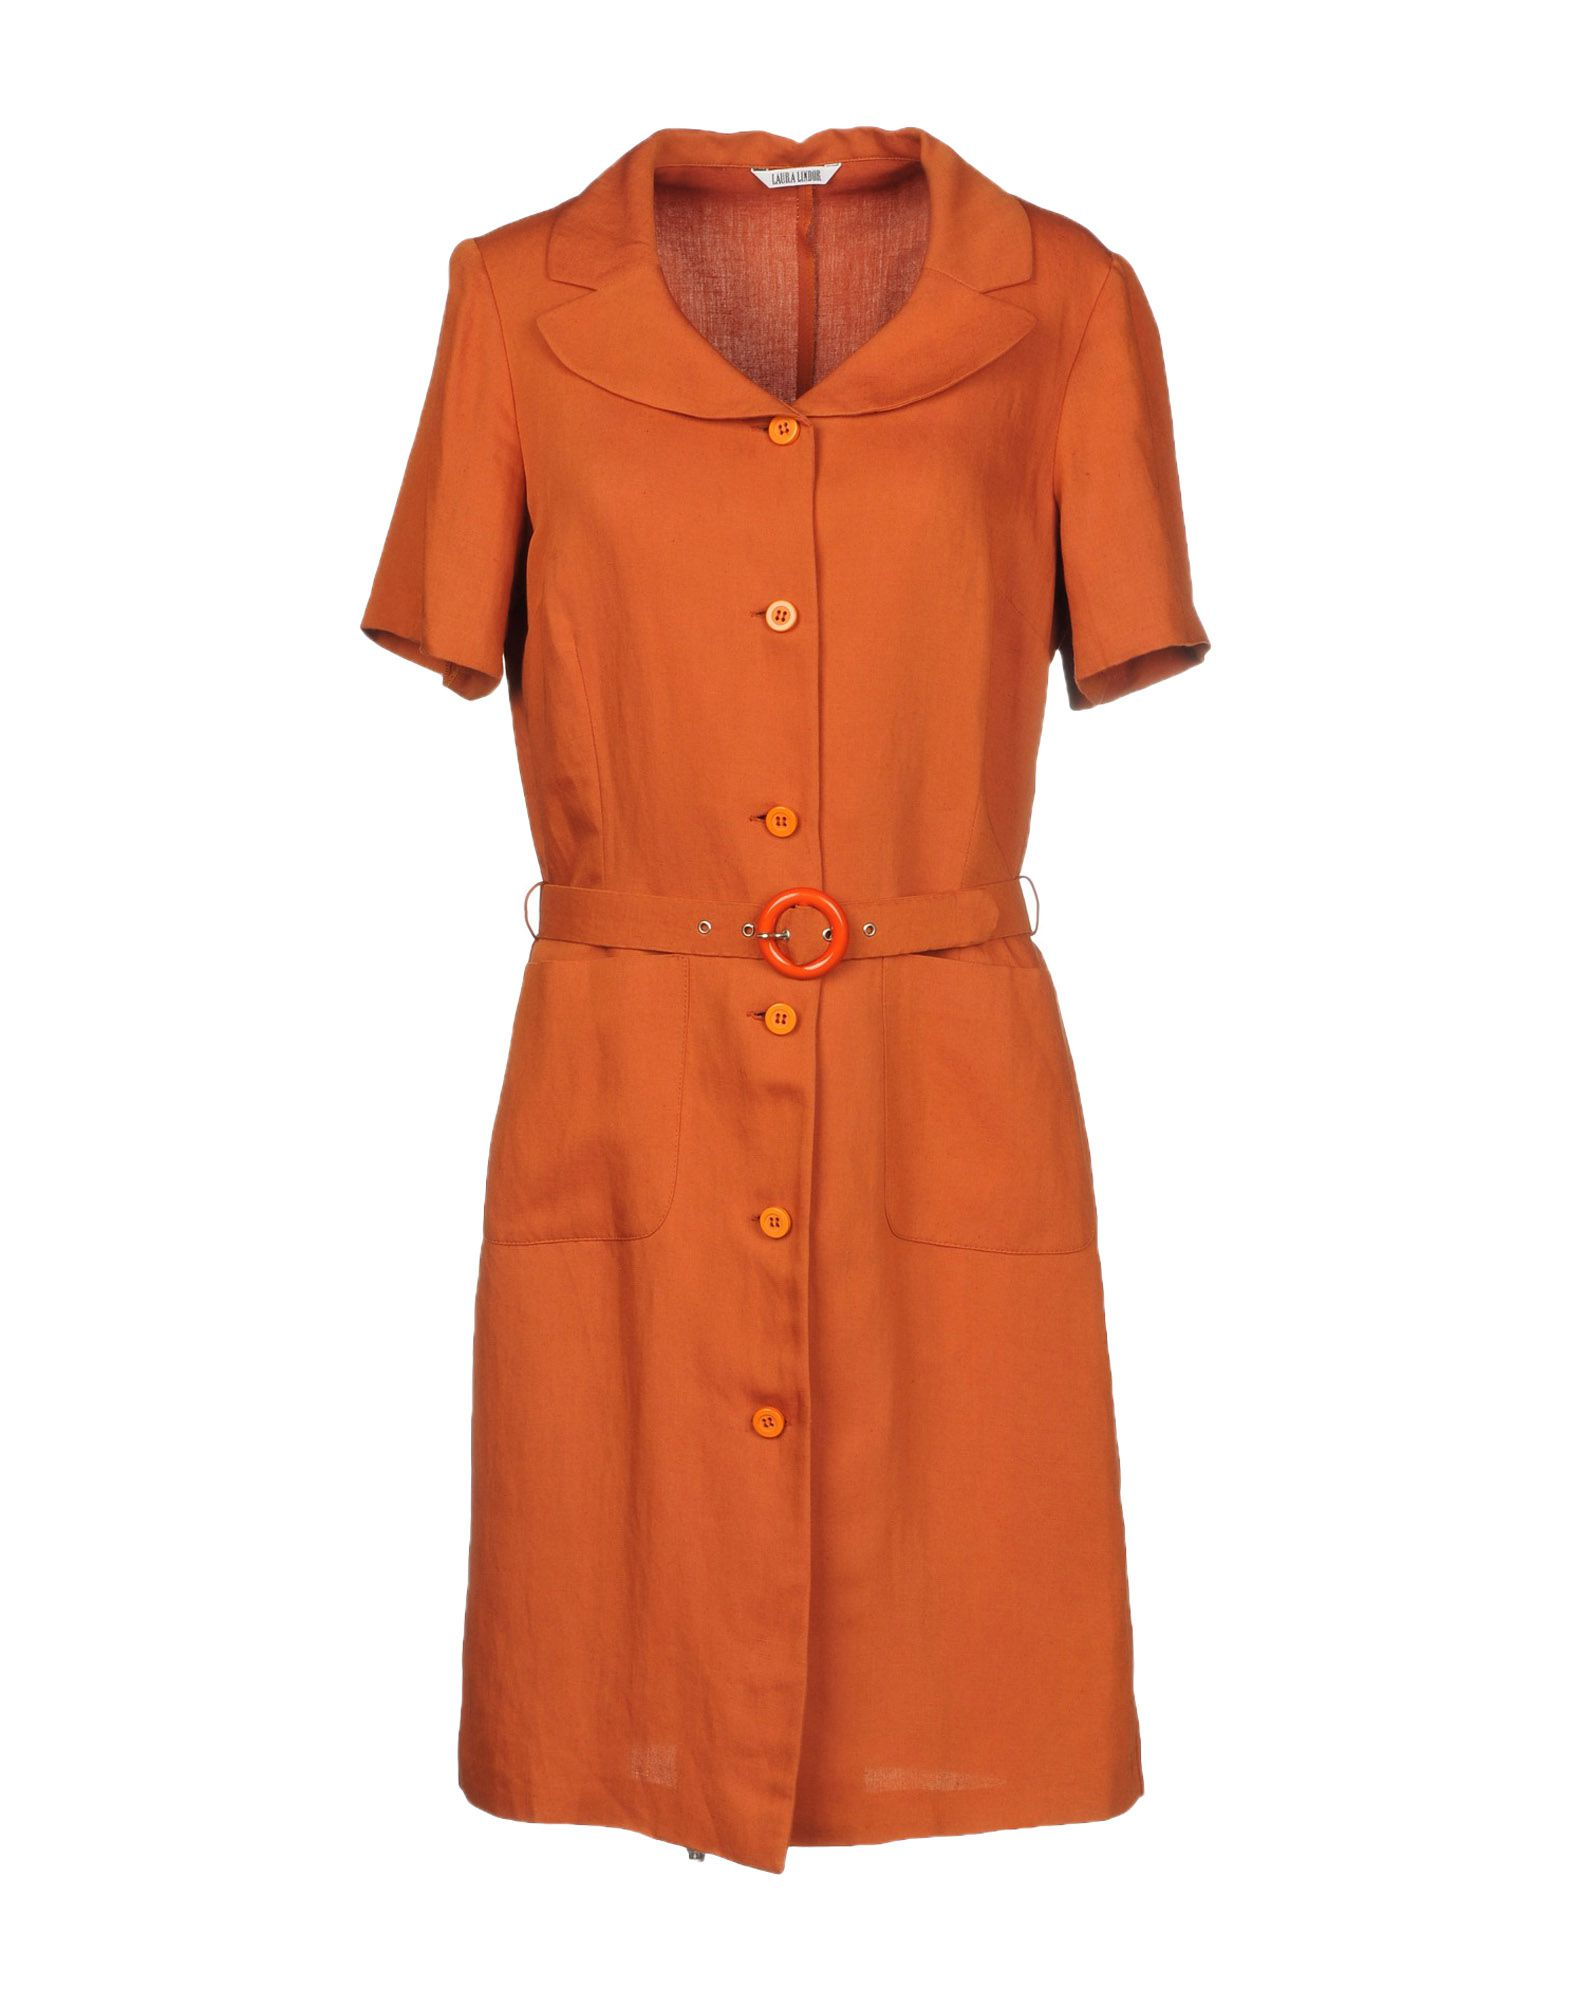 LAURA LINDOR Короткое платье laura ashley vintage платье 1980 1990 е